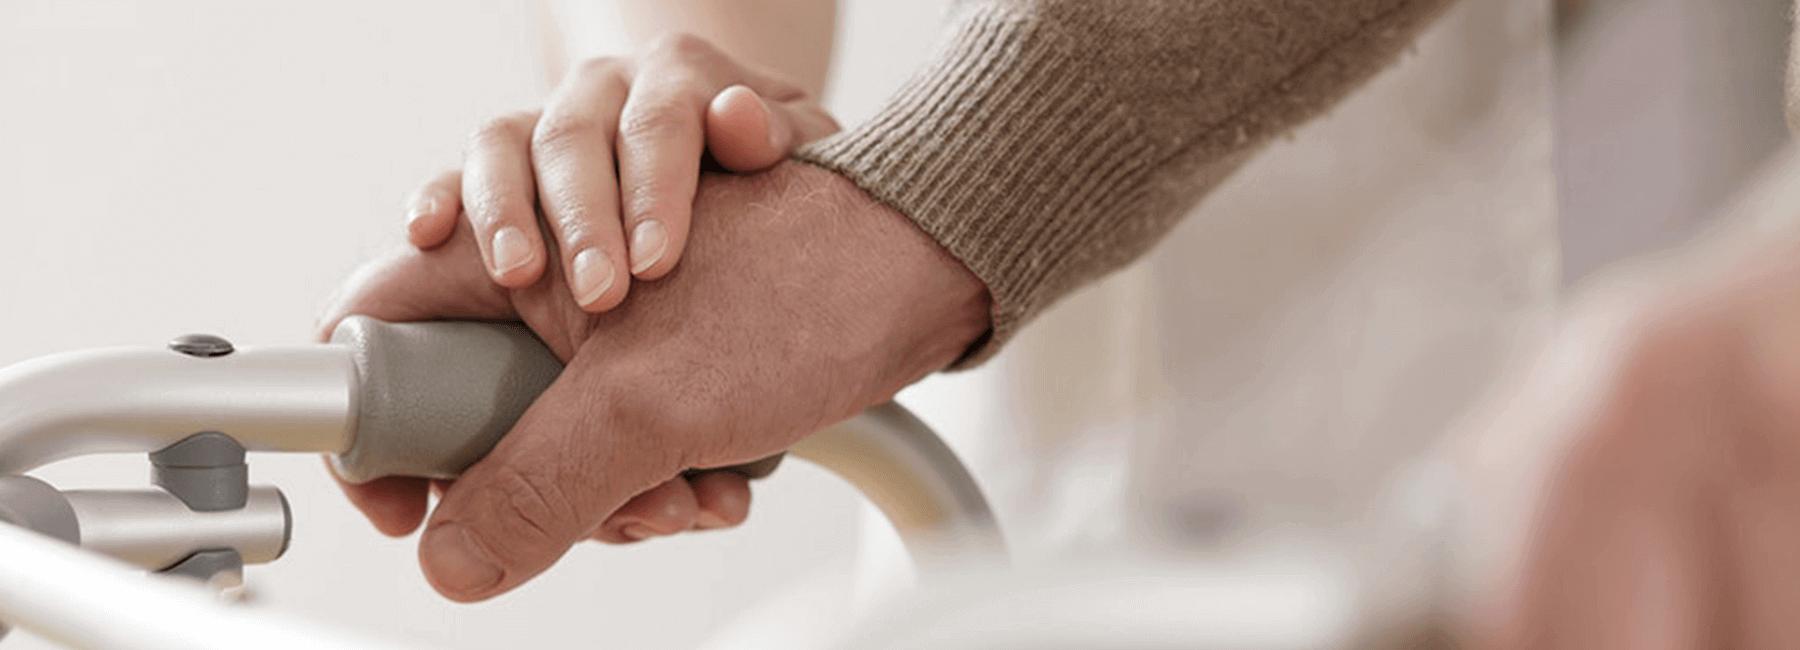 Braemar Care Services In Essex Dementia Day Support